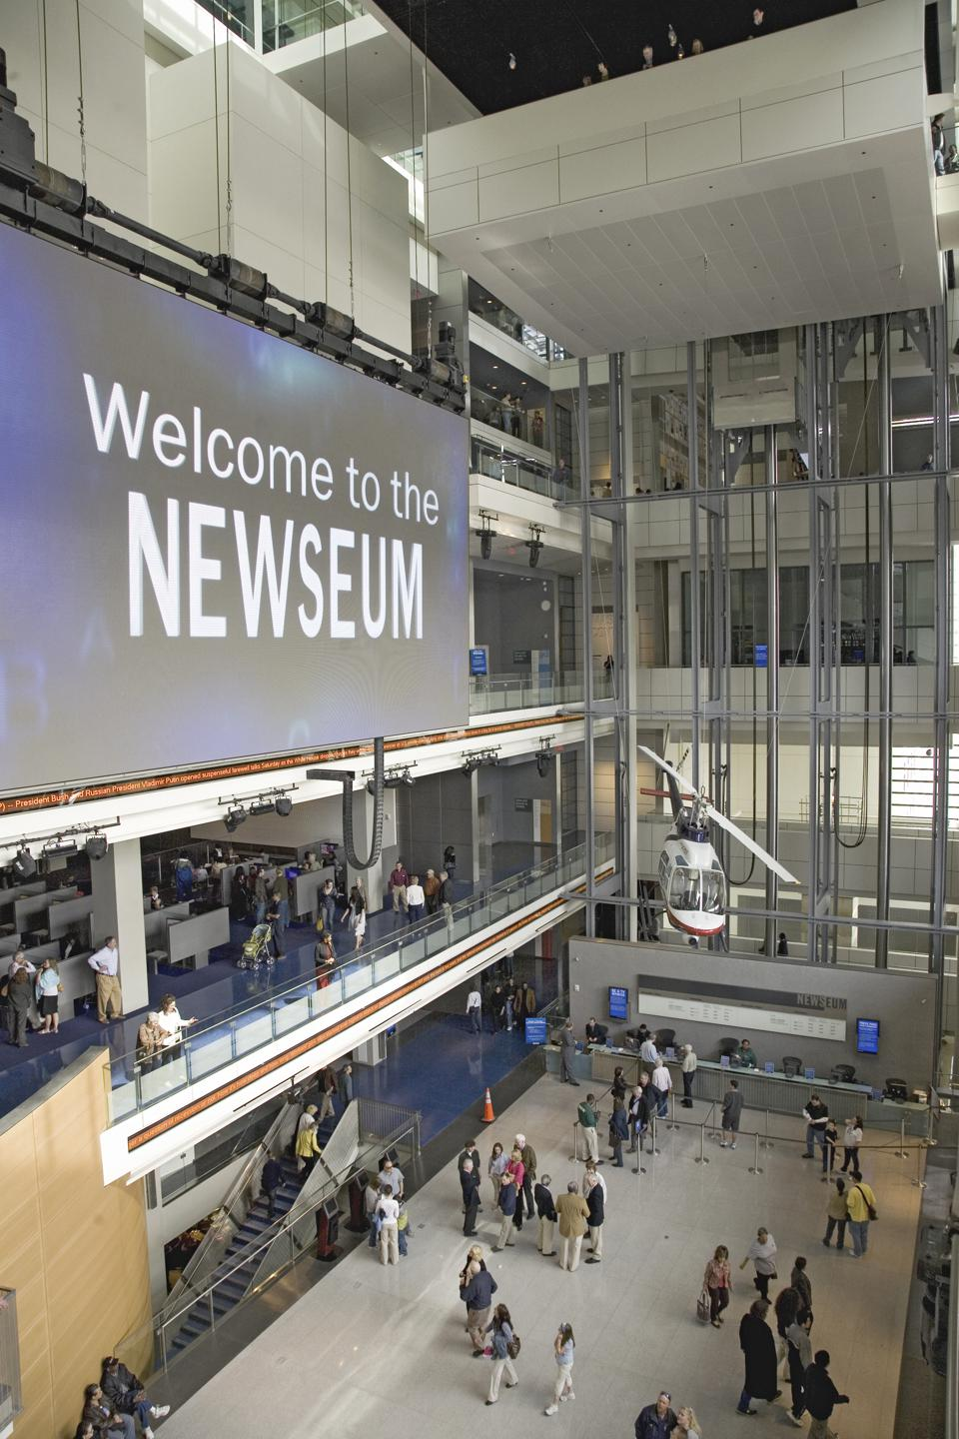 The Newseum Museum of News on Pennsylvania Avenue, Washington, D.C.